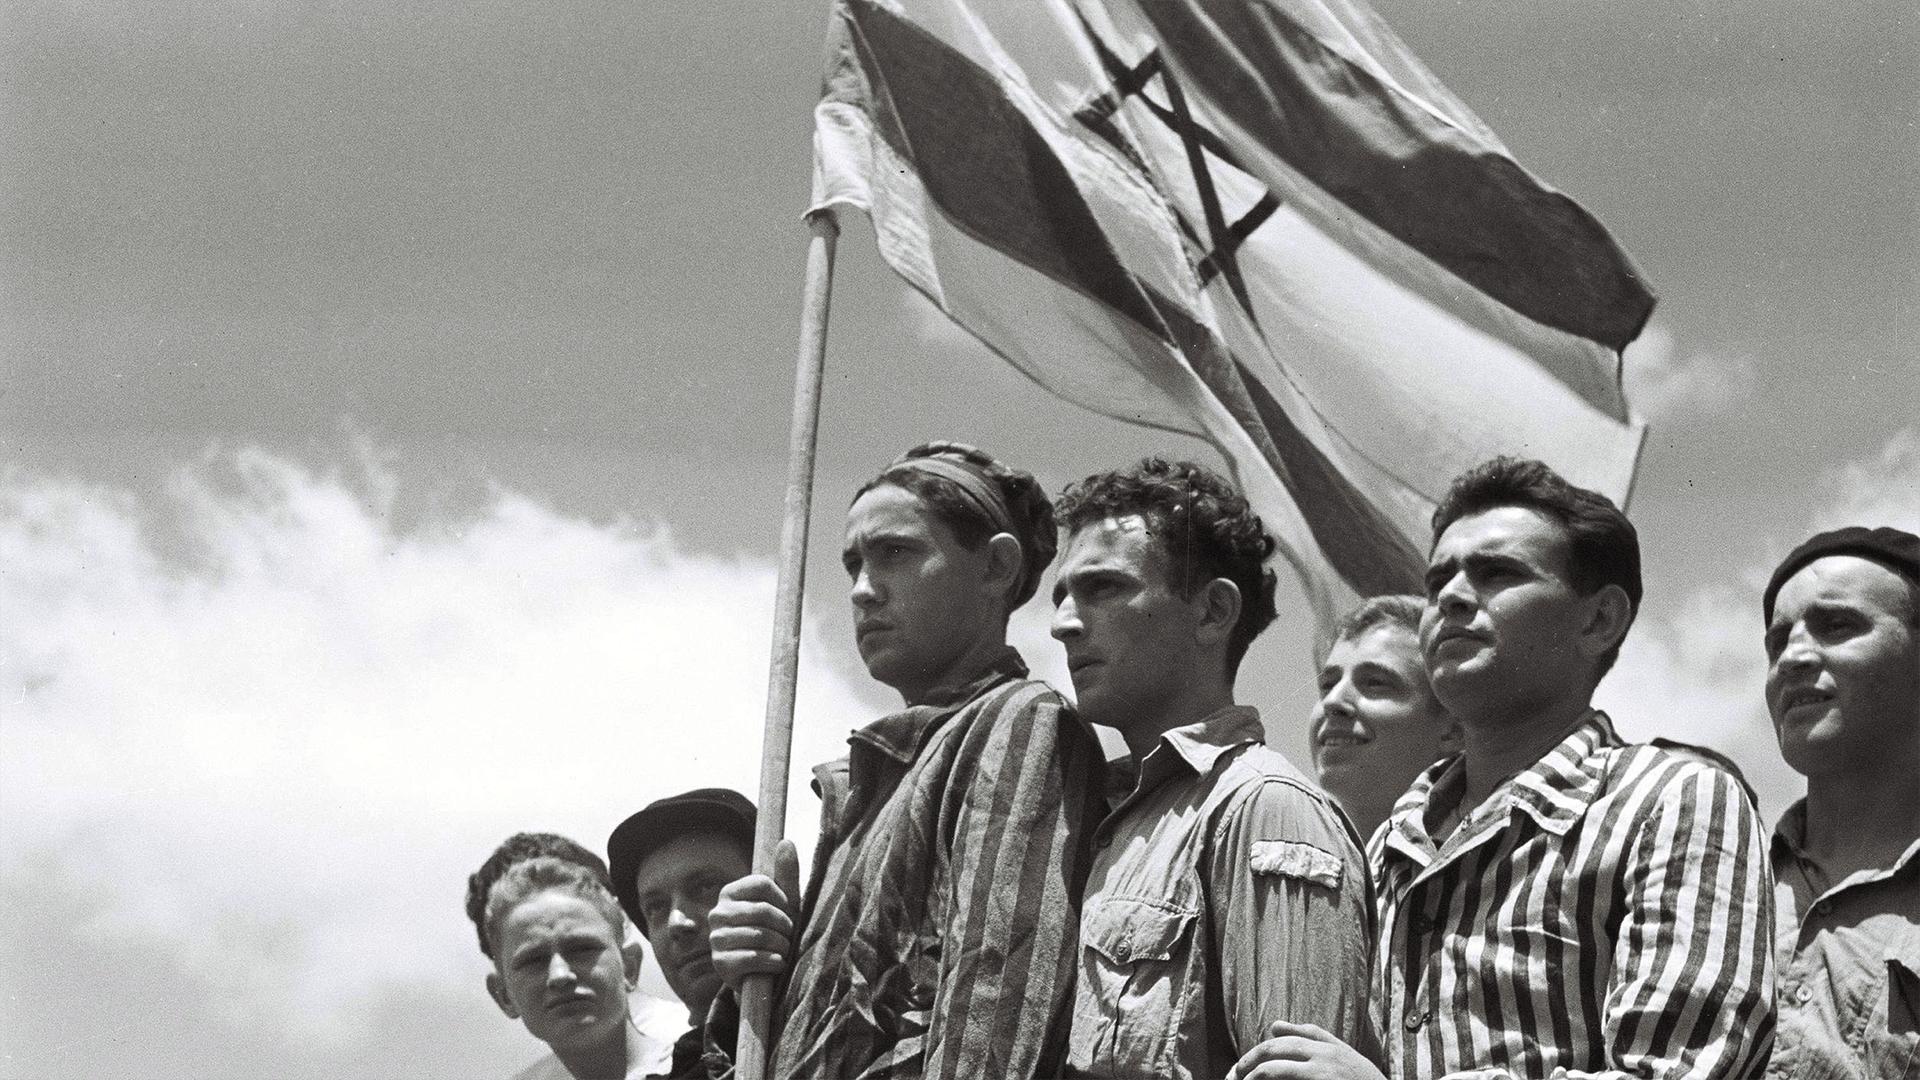 70 ans après, où va Israël ? Florence Taubmann Gérard Benhamou